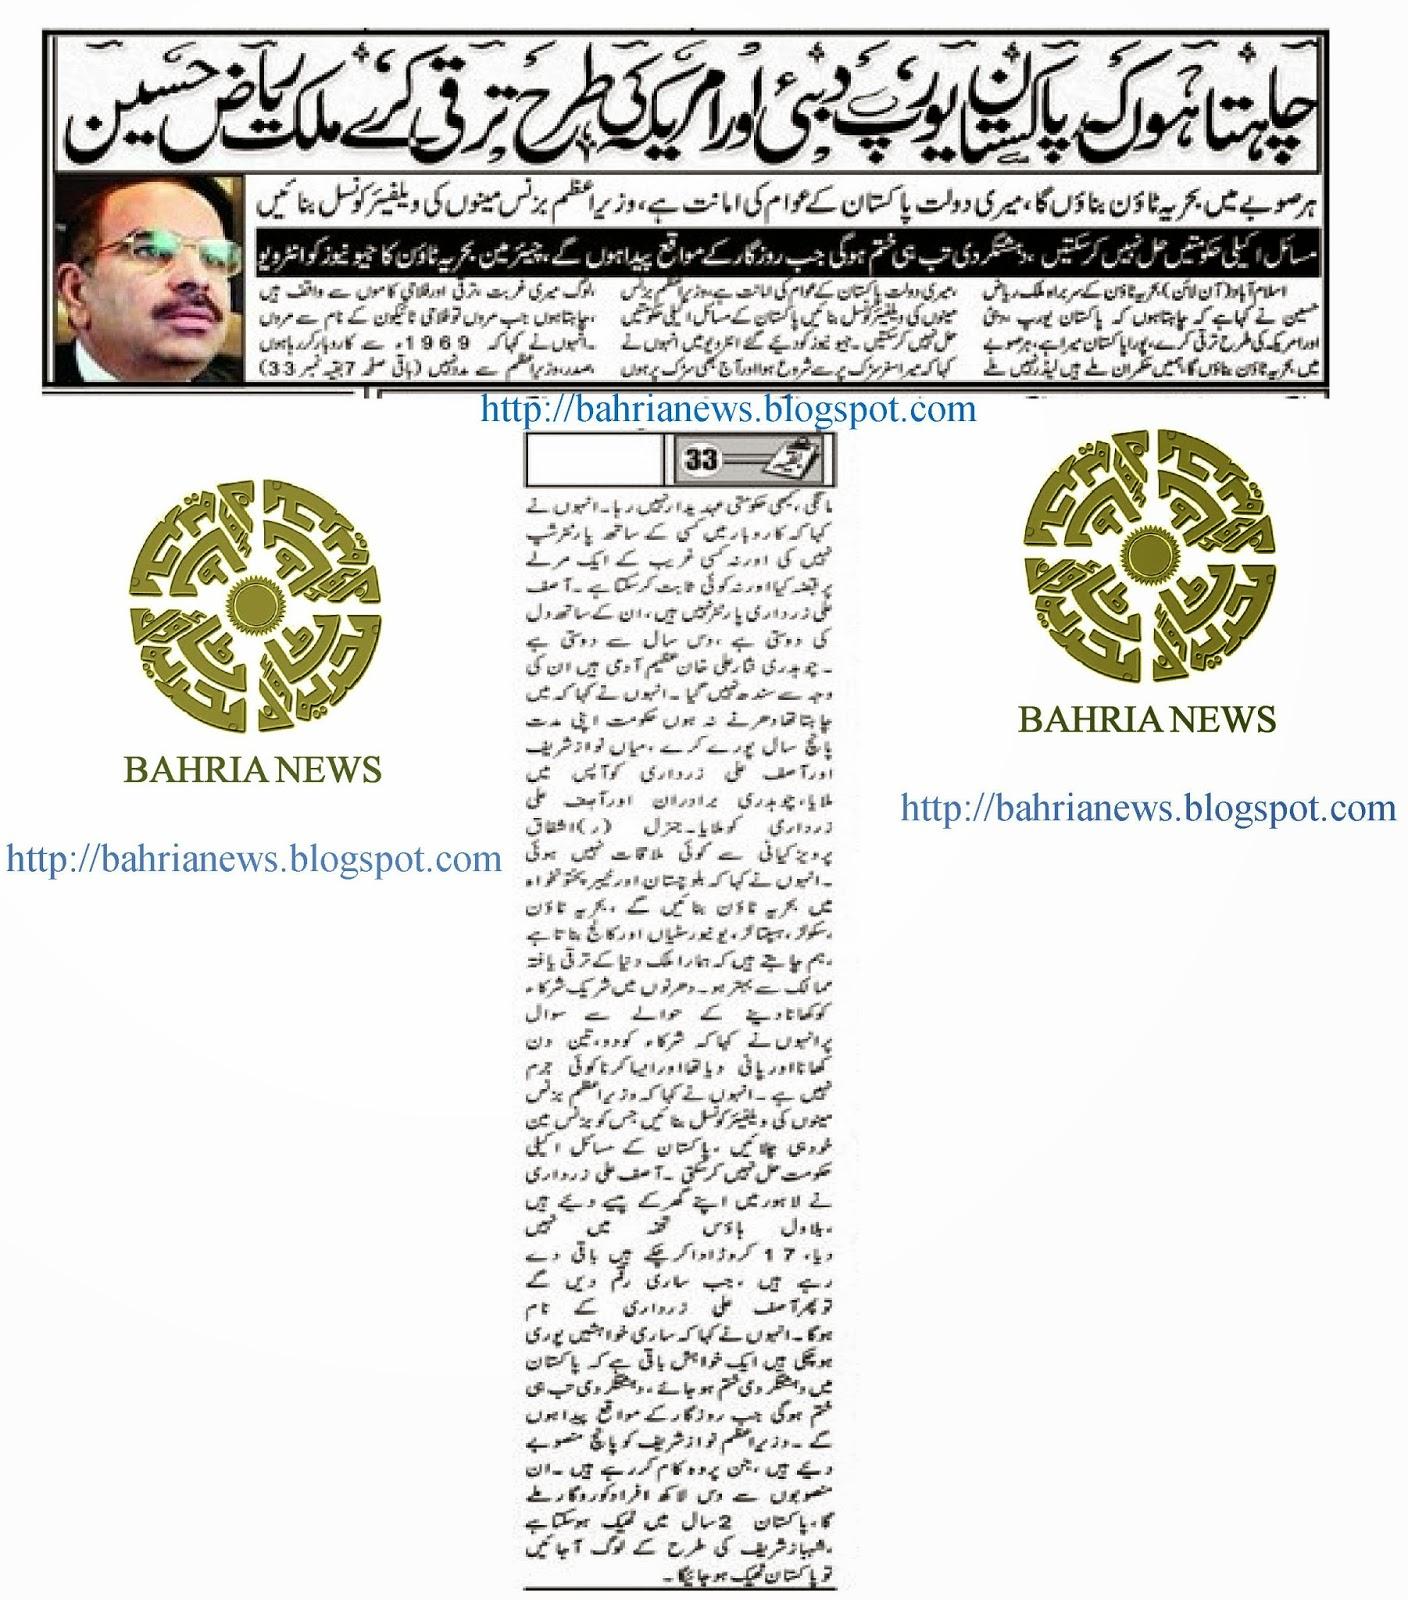 Bahria news news every man of substance patronises land mafia said malik riaz with saleem safi altavistaventures Gallery